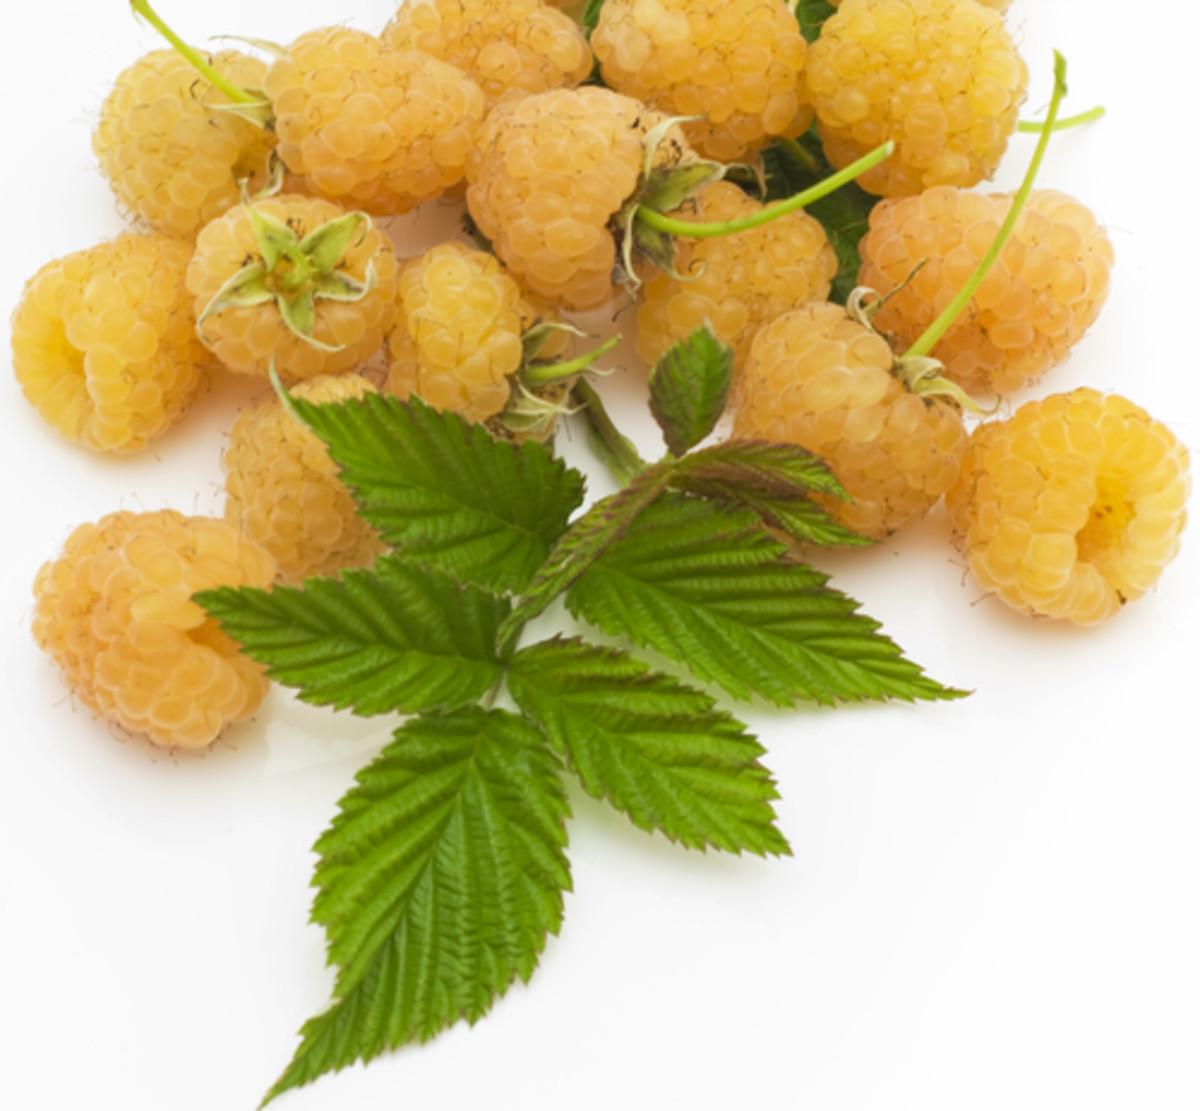 Yellow Raspberries. Image:  Aprilphoto Shutterstock.com